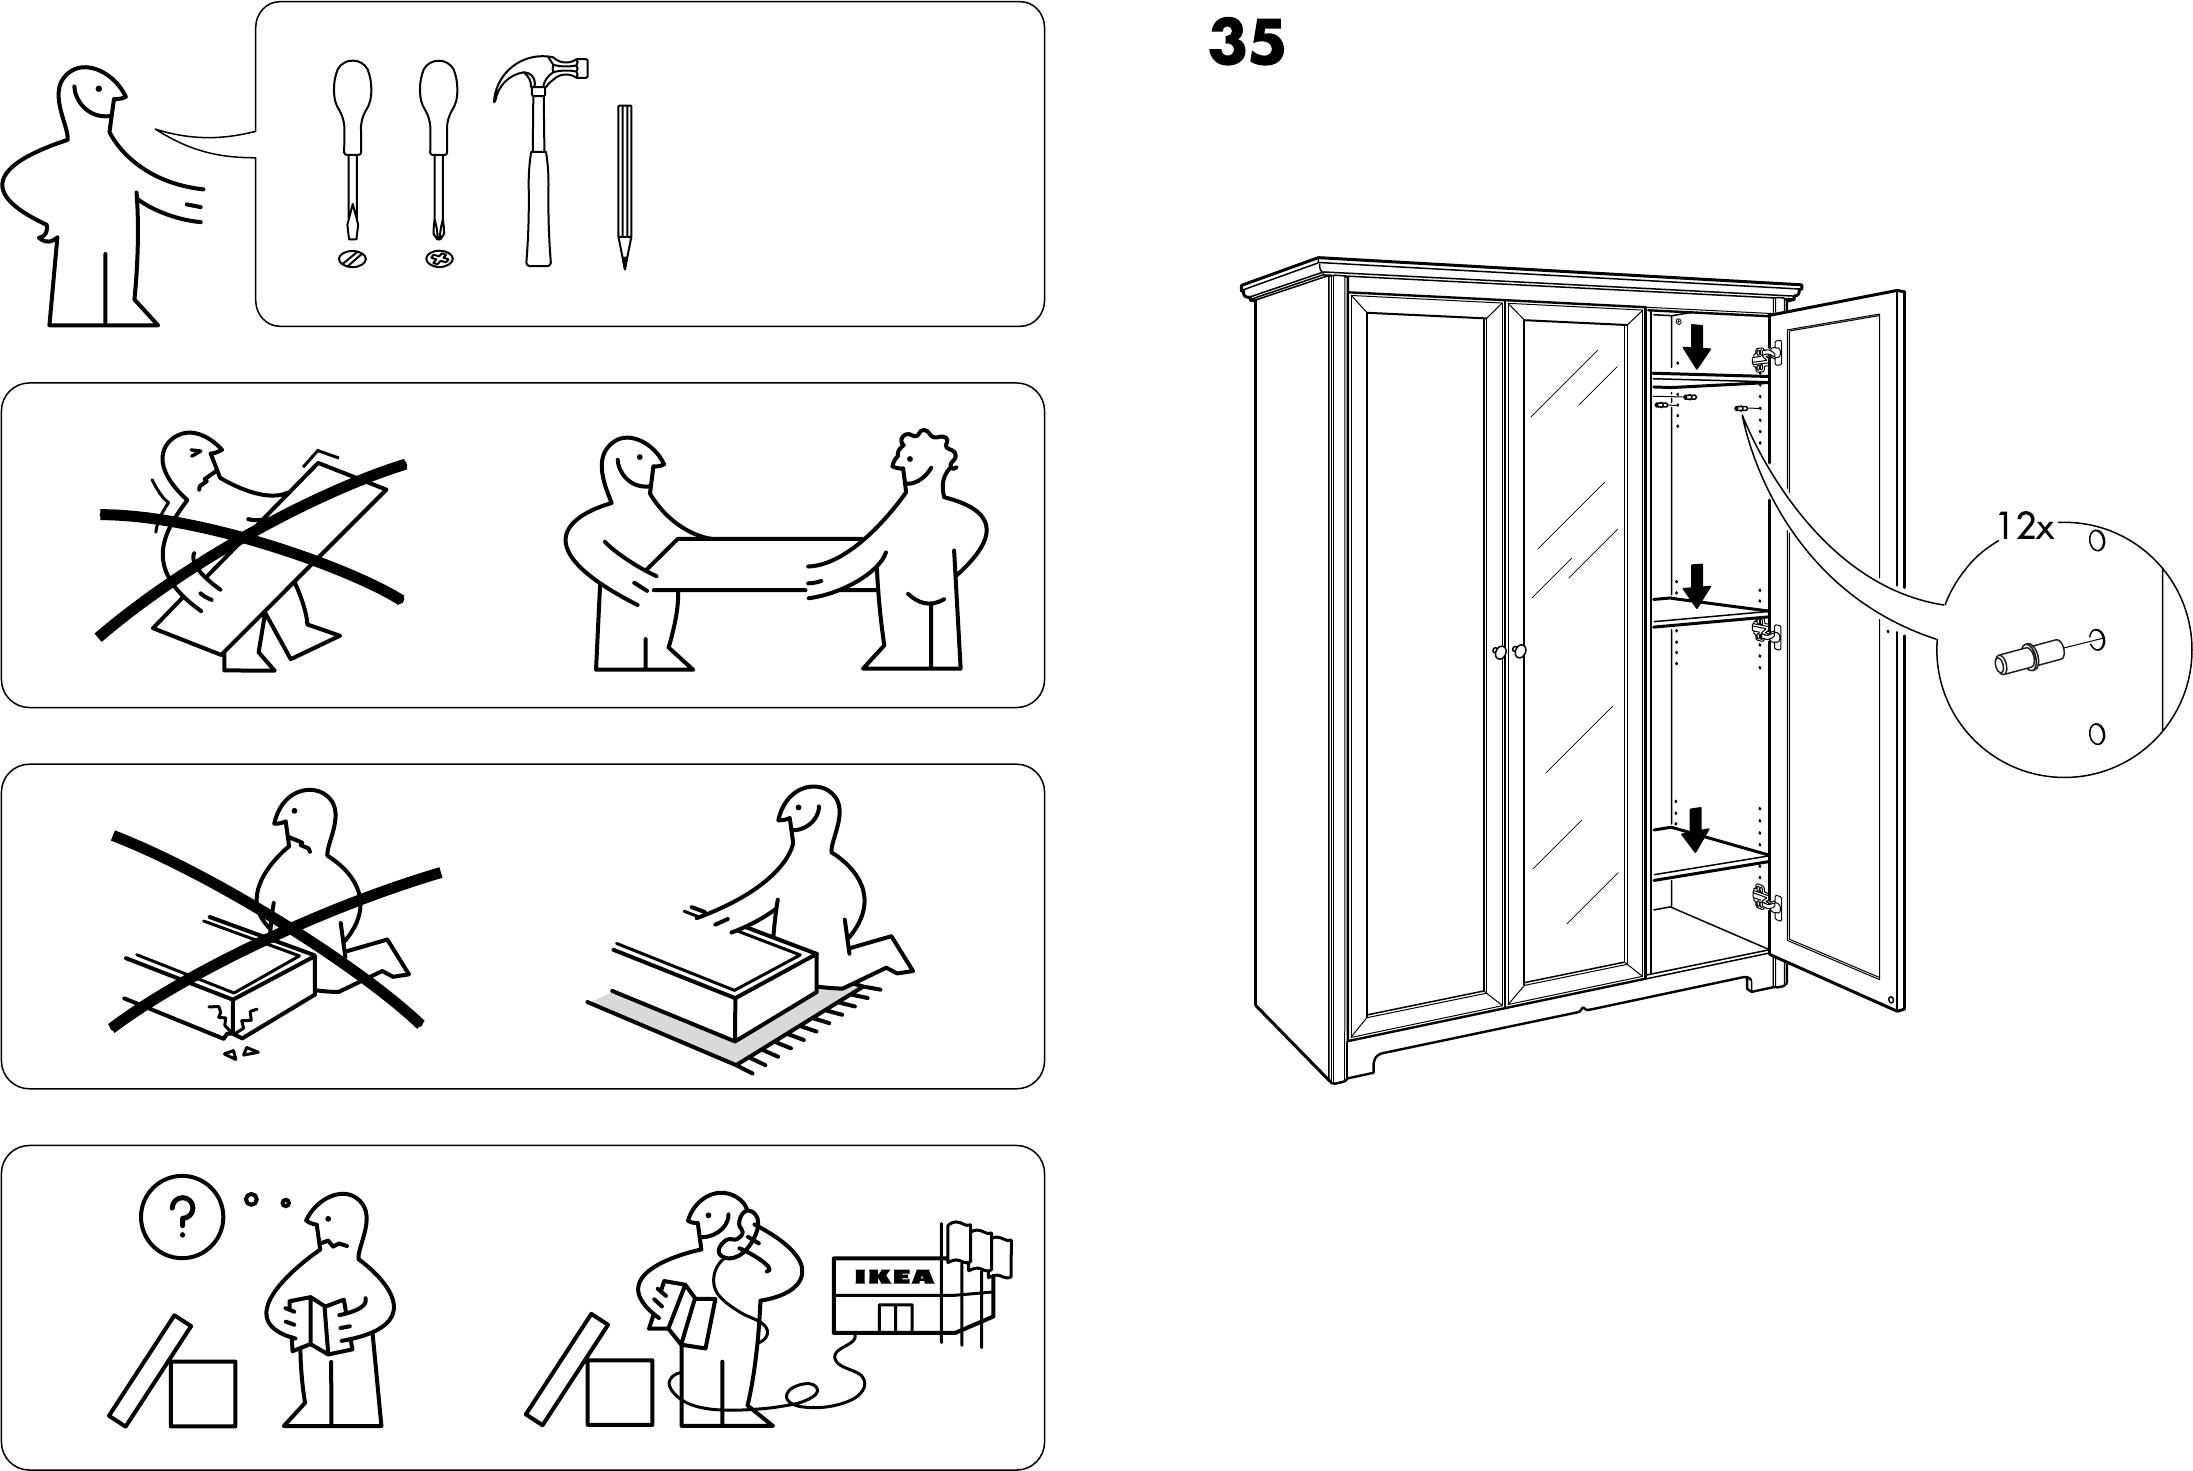 Aspelund Garderobekast Met 3 Deuren.Handleiding Ikea Aspelund Garderobekast Pagina 1 Van 14